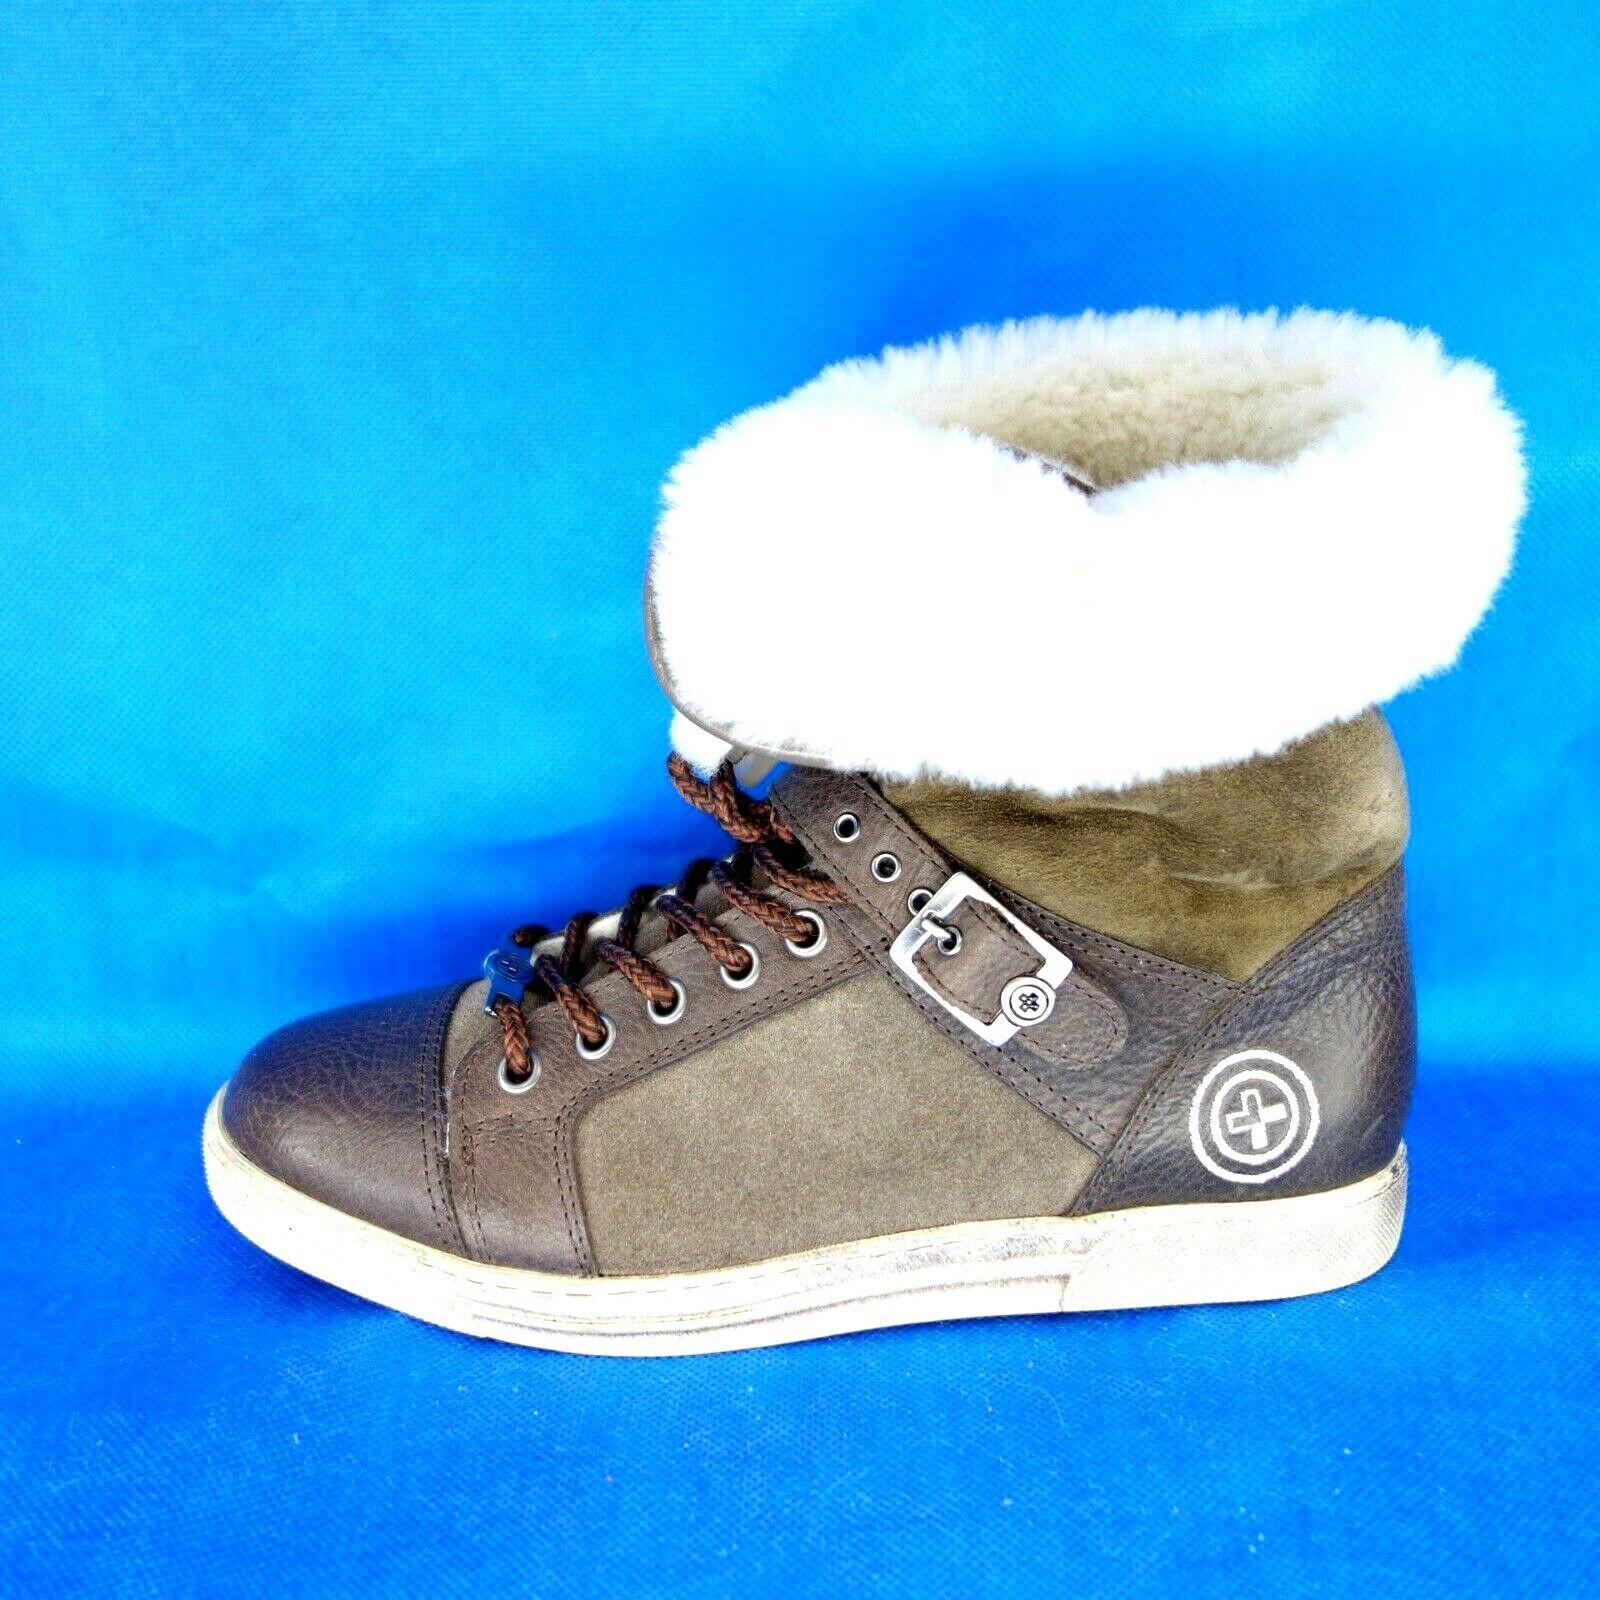 GINO B Damen Winter Schuhe Stiefel Turnschuhe KITZBUHEL 37 Braun Lammfell Np 325 Neu